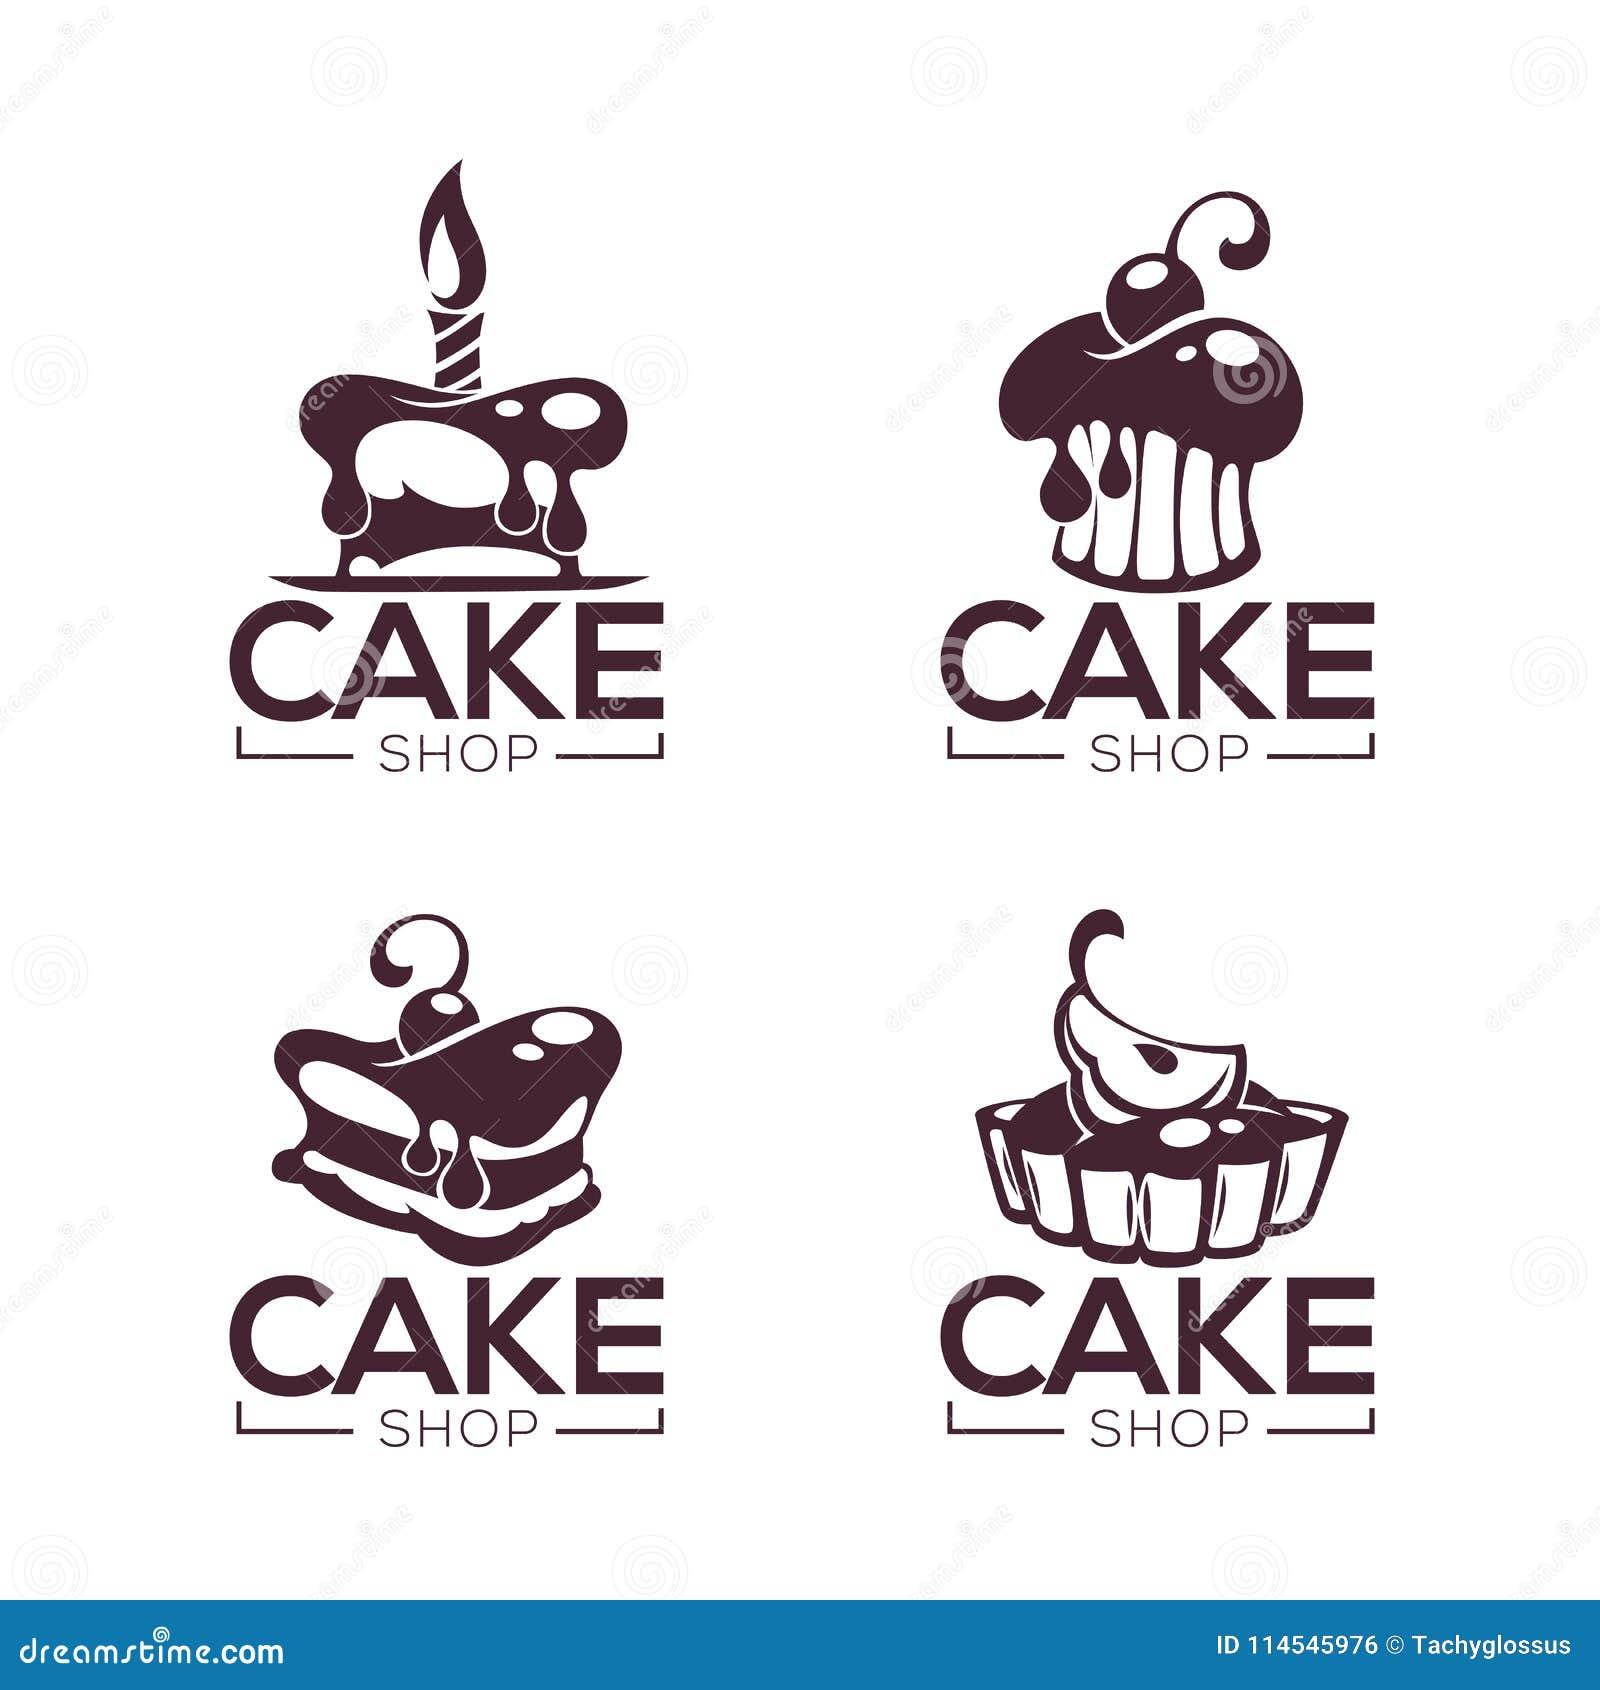 De bakkerij, gebakje, banketbakkerij, cake, dessert, snoepjes winkelt, vecto